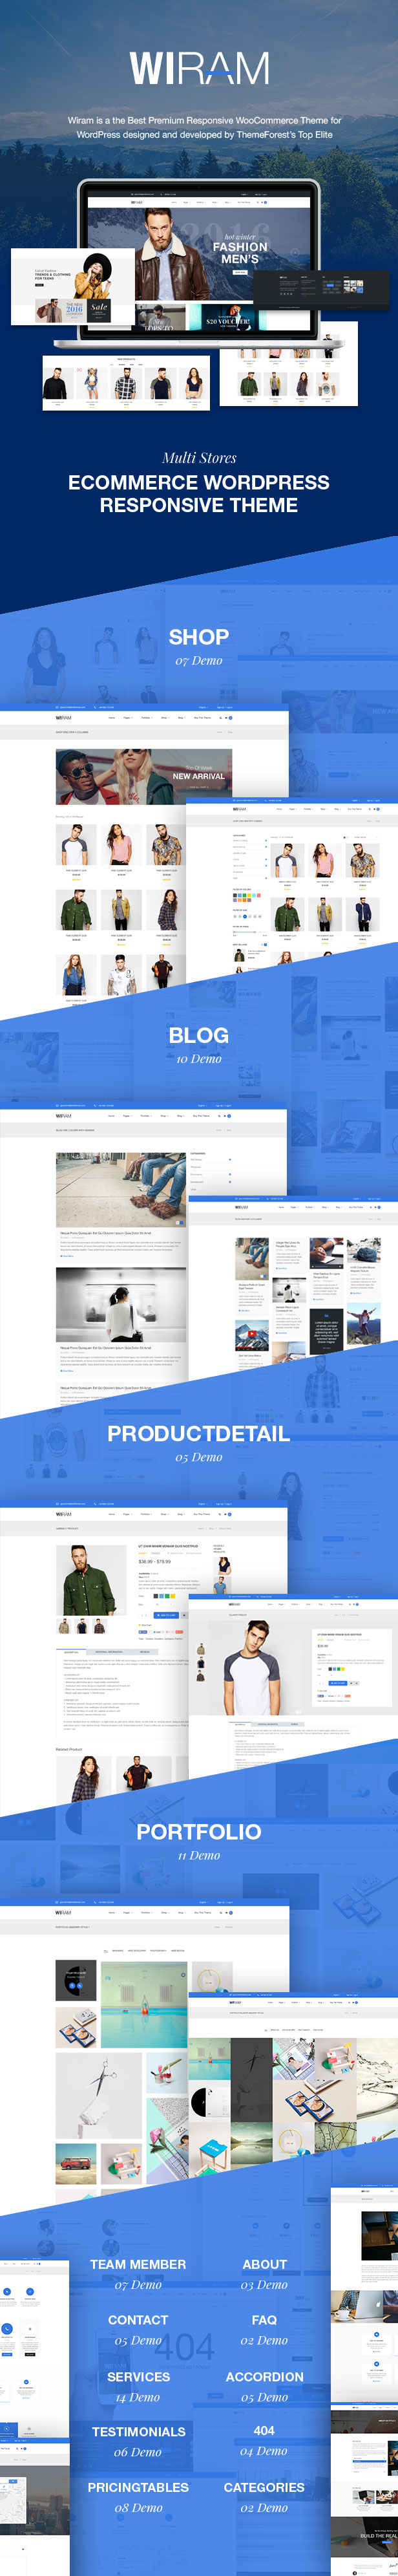 WordPress theme WPDANCE - Multipurpose WooCommerce WordPress Theme | WIRAM (eCommerce)